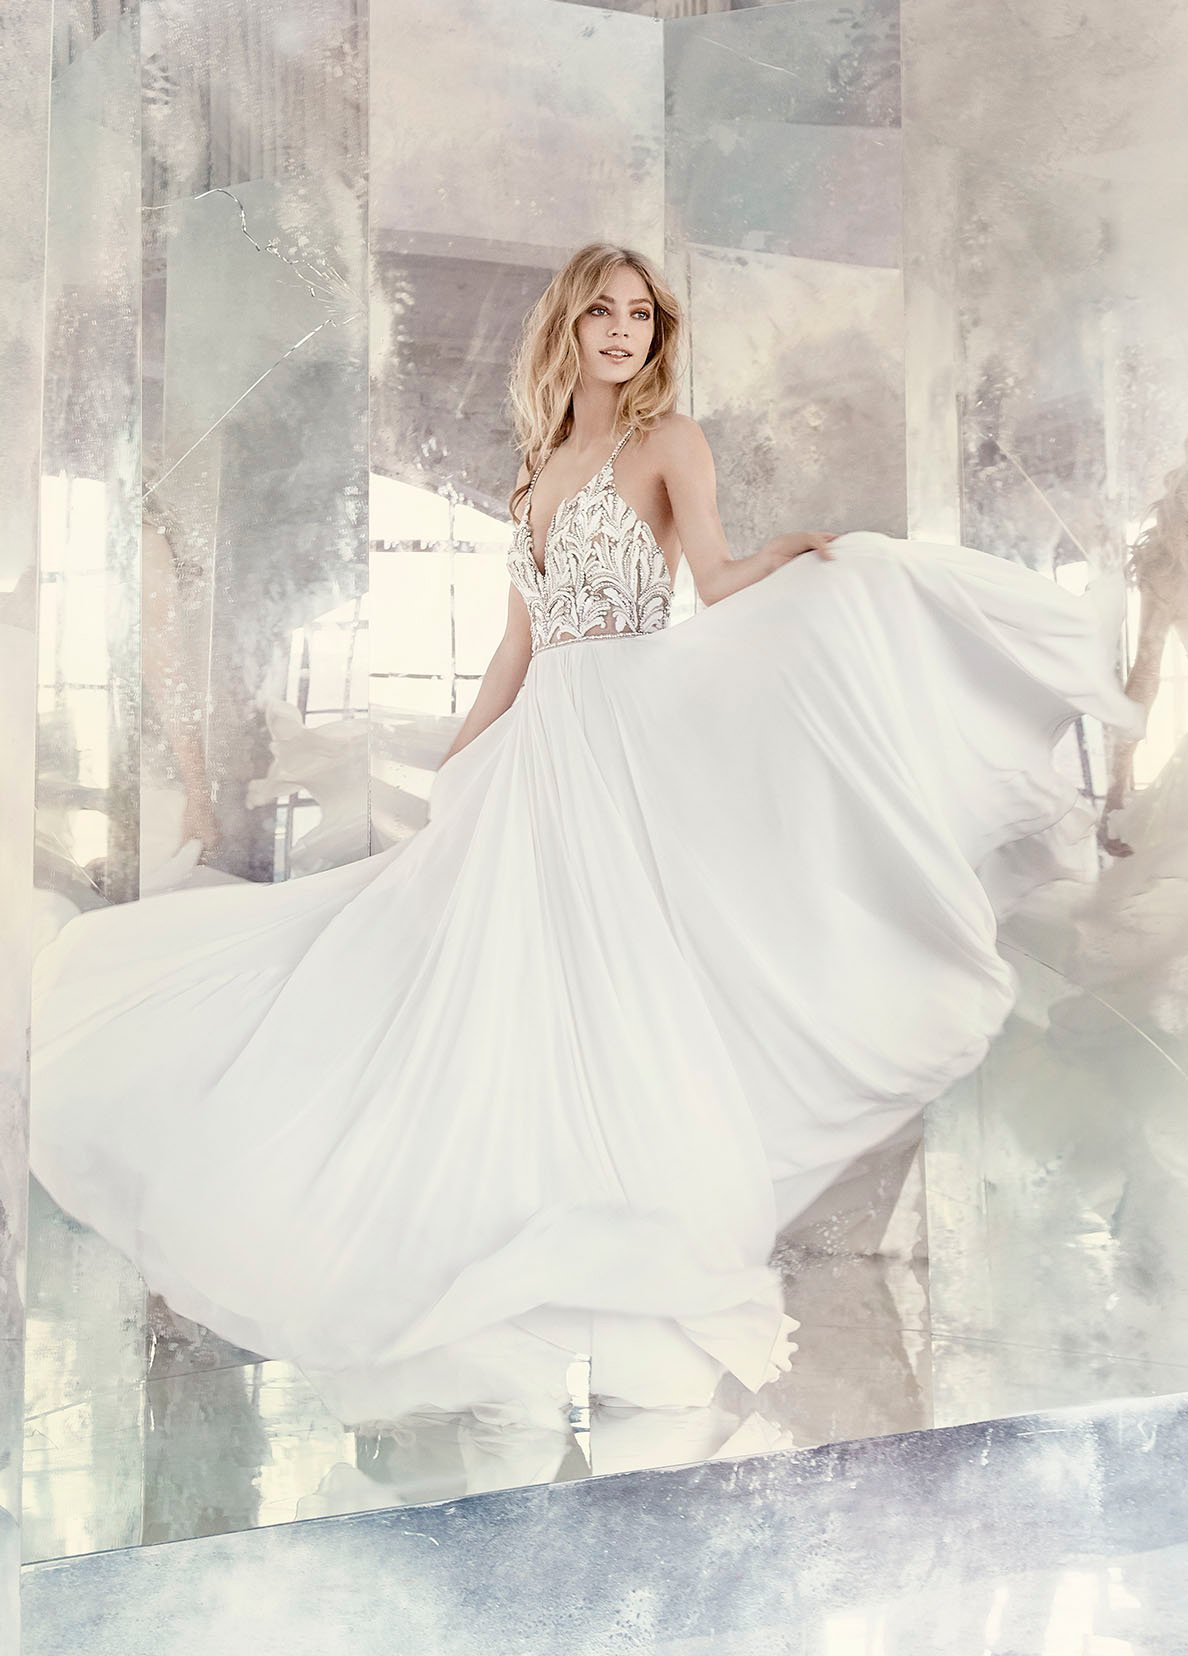 Dress Bridal Grown Bridal Boutique Sioux Falls Sd